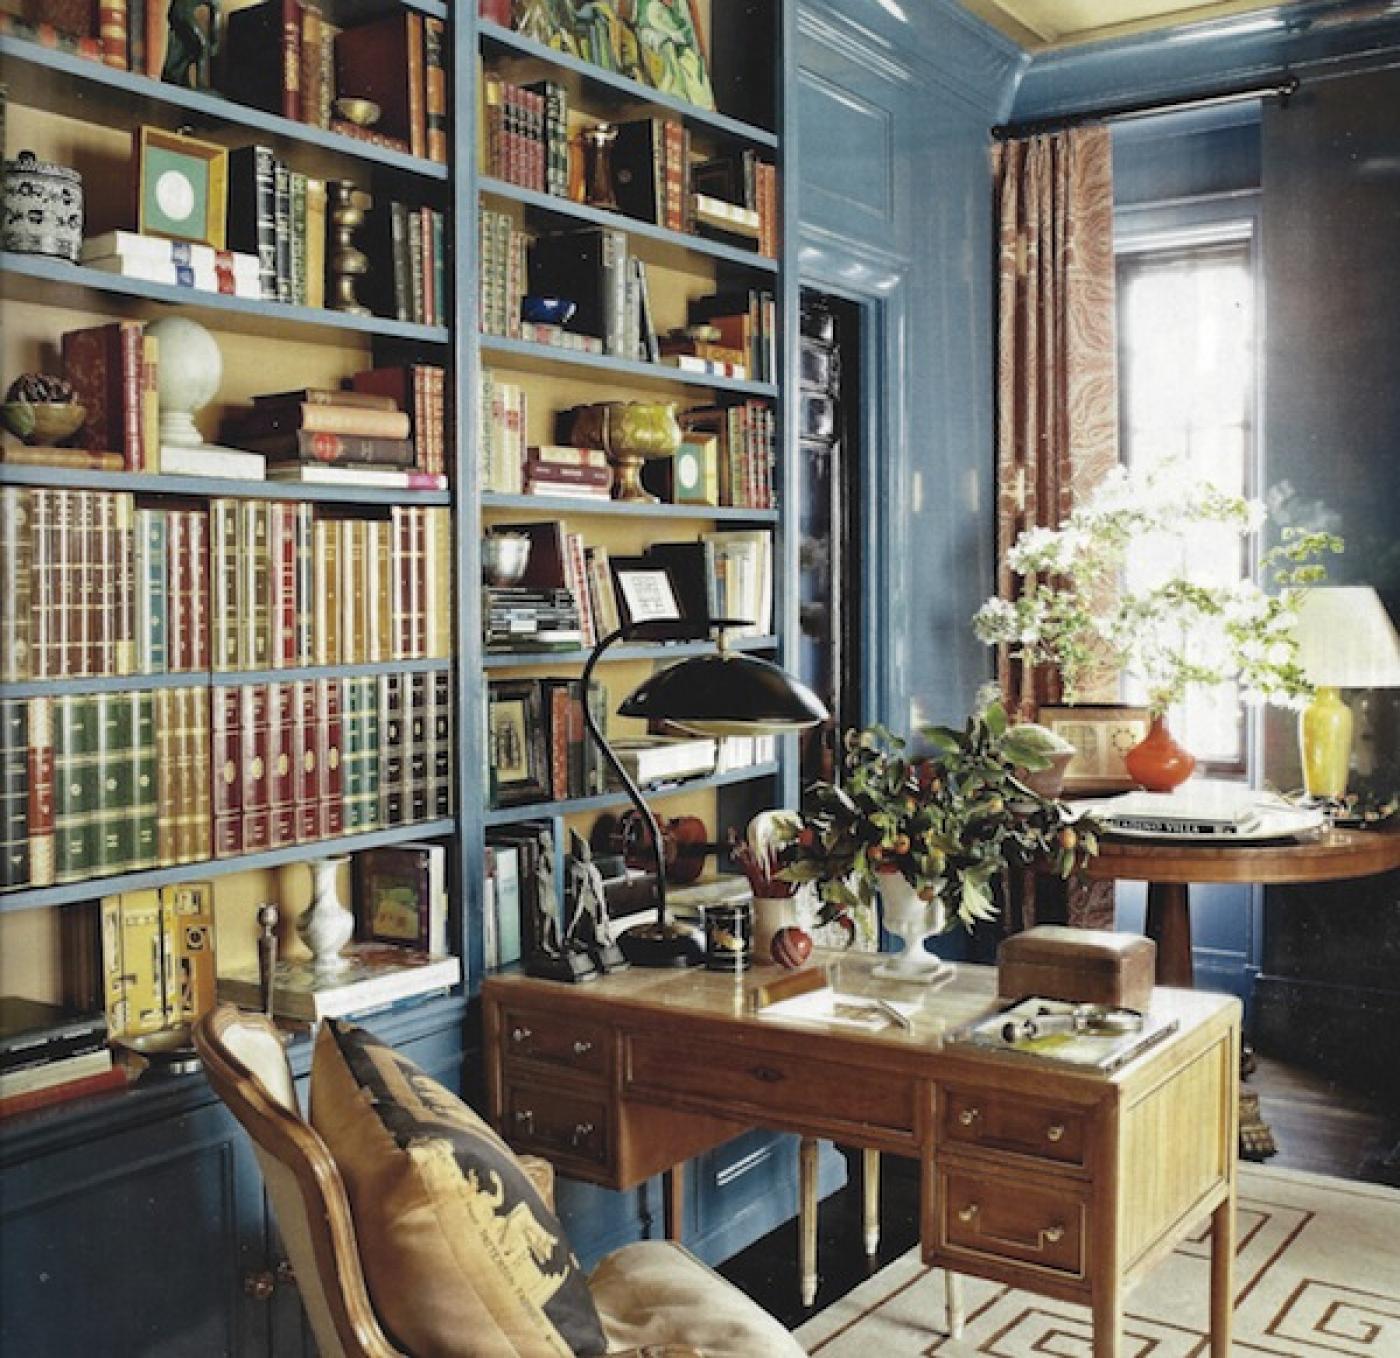 New york city apartment by garrow kedigian interior design for Interior design new york city